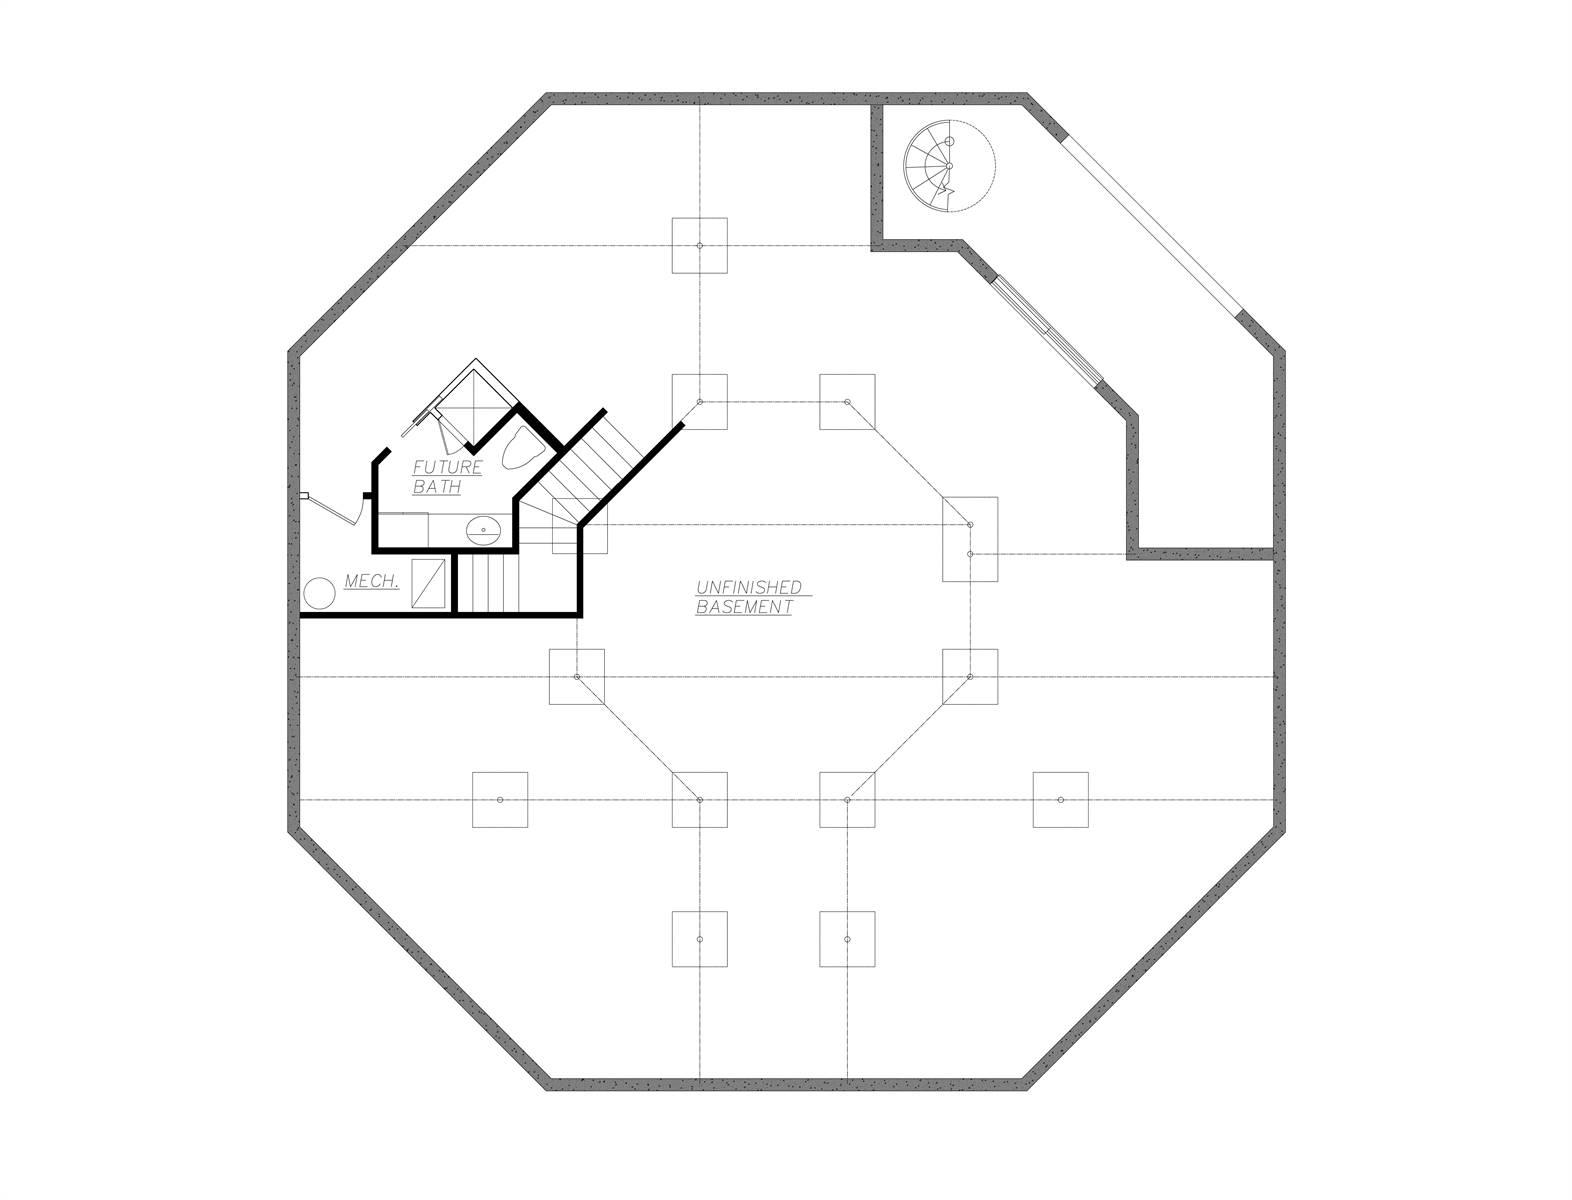 Basement Plan by DFD House Plans